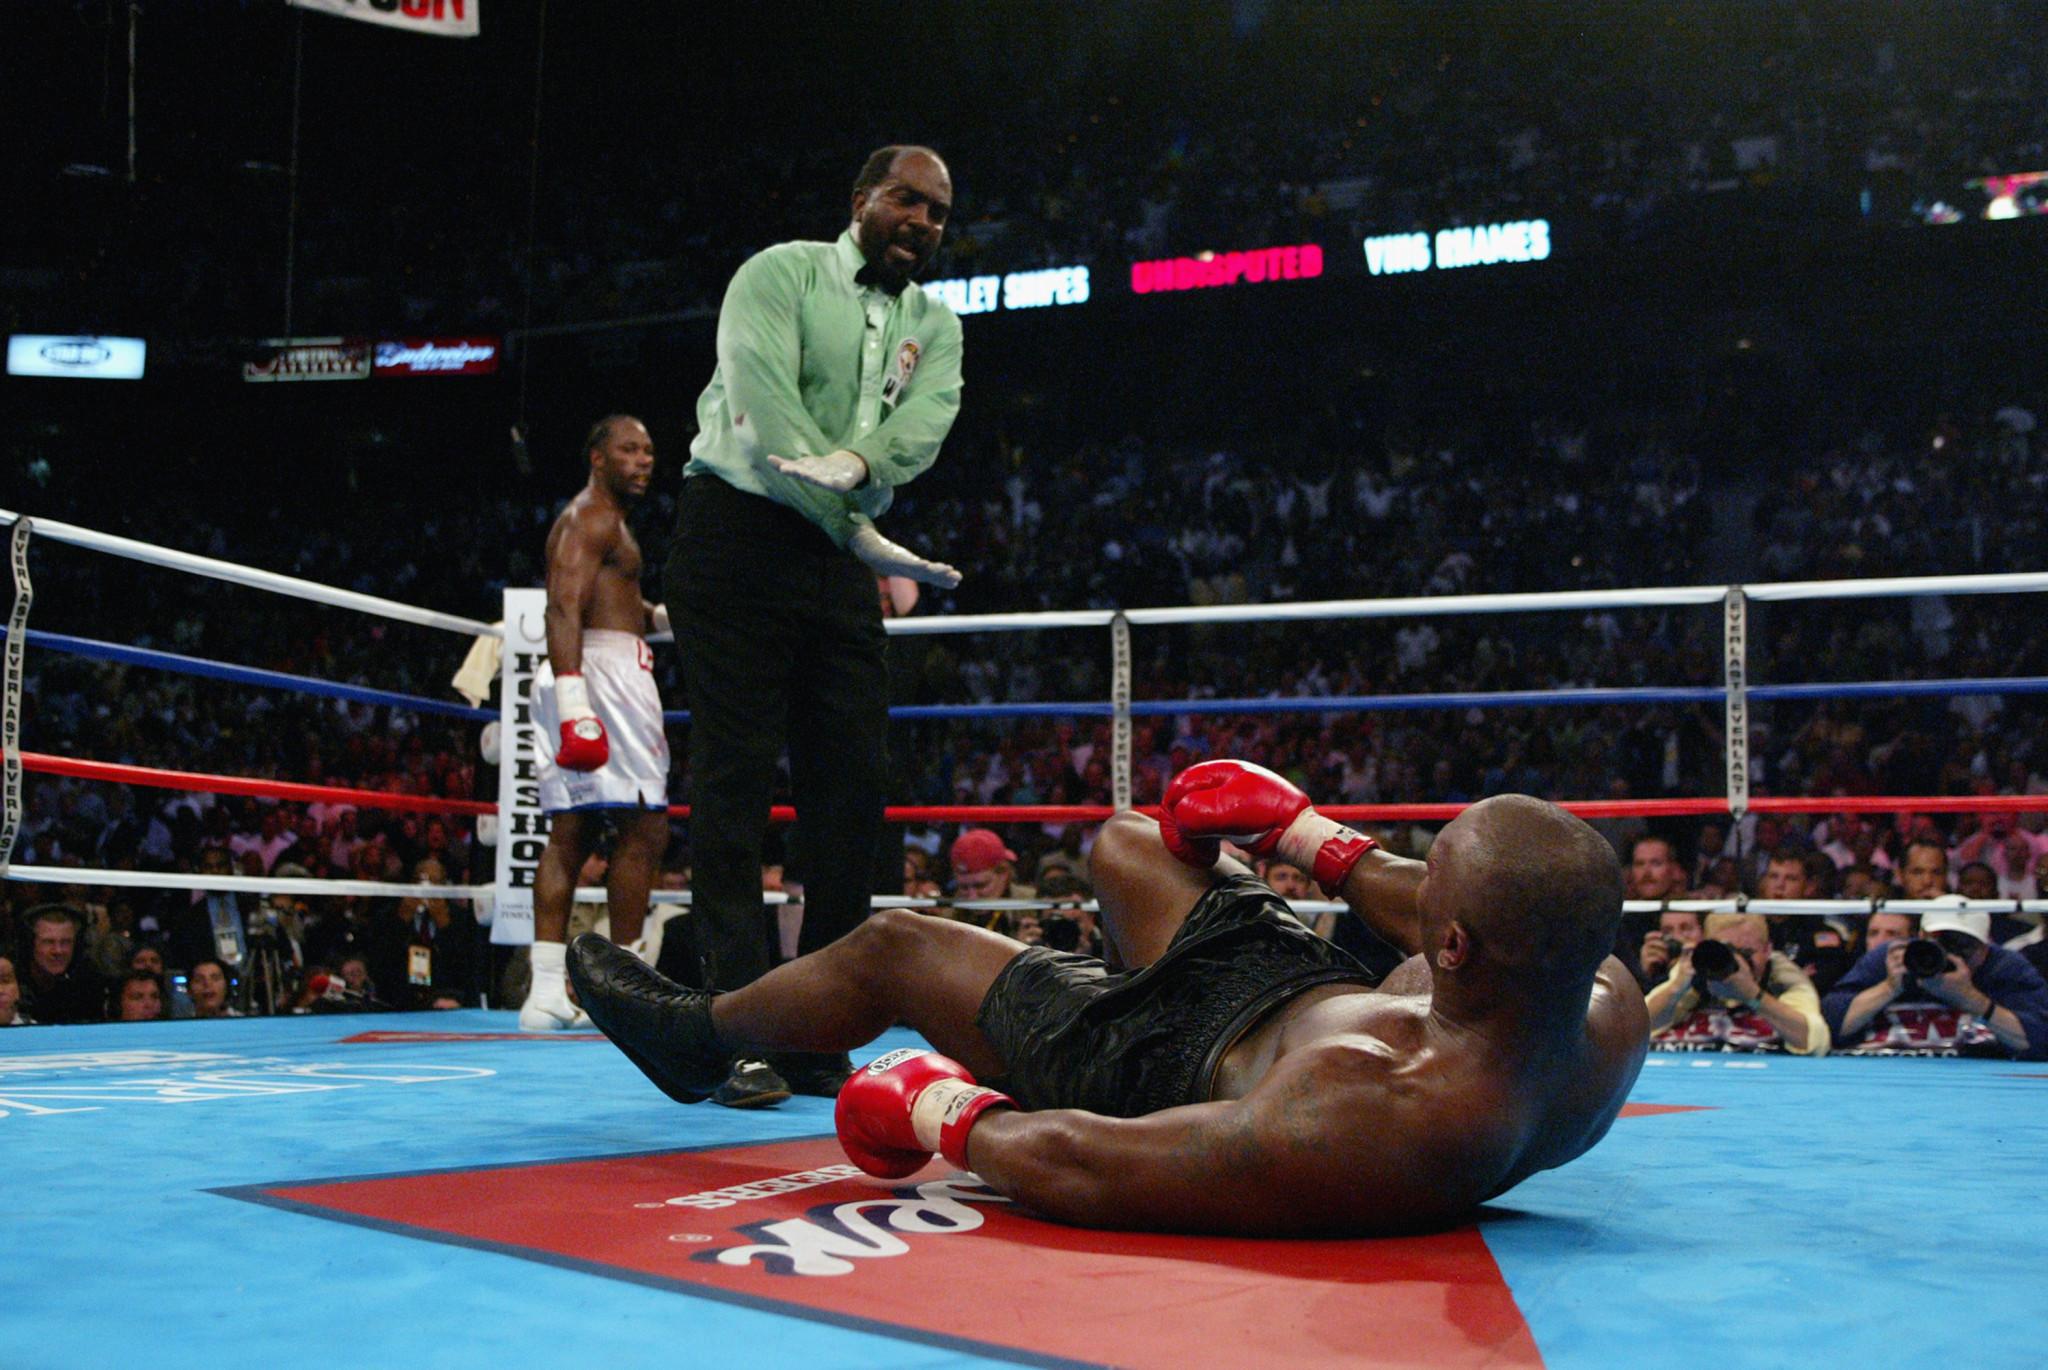 Long-serving boxing referee Cotton dies of coronavirus